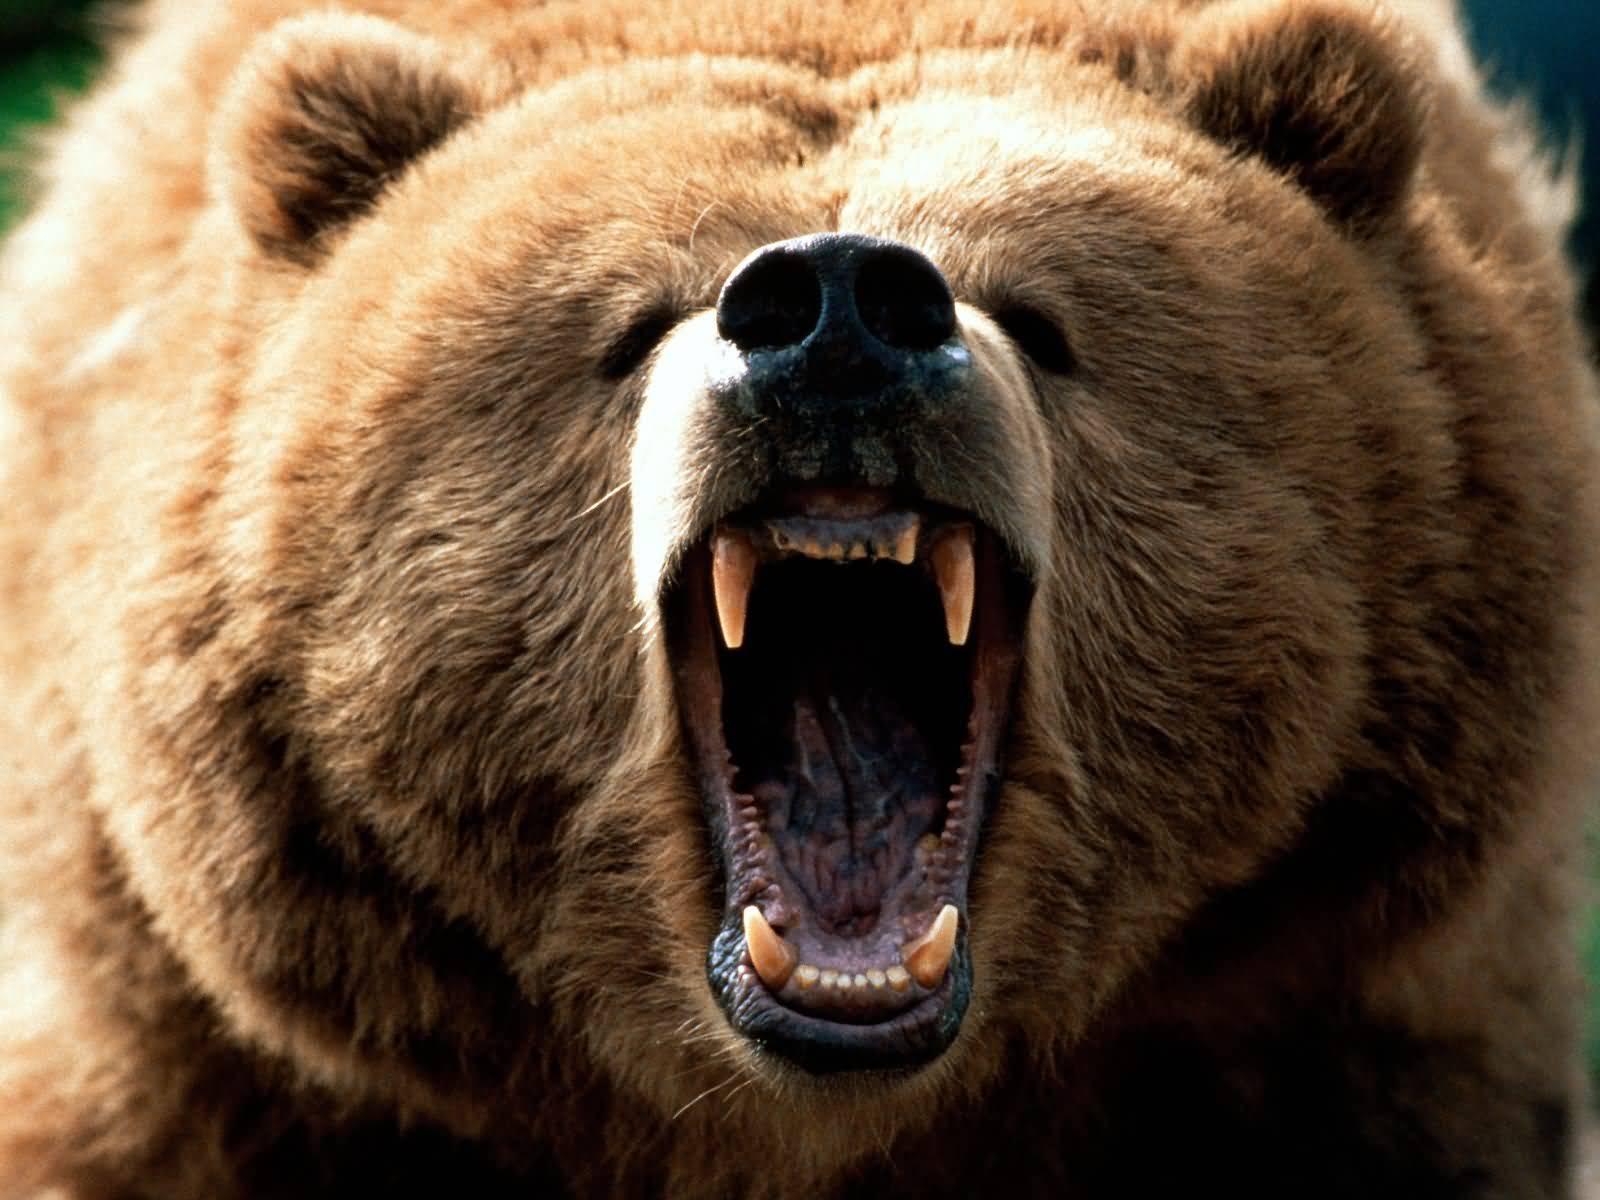 Kodiak Bear Vs Silver Back Gorilla Hell In A Cell Match